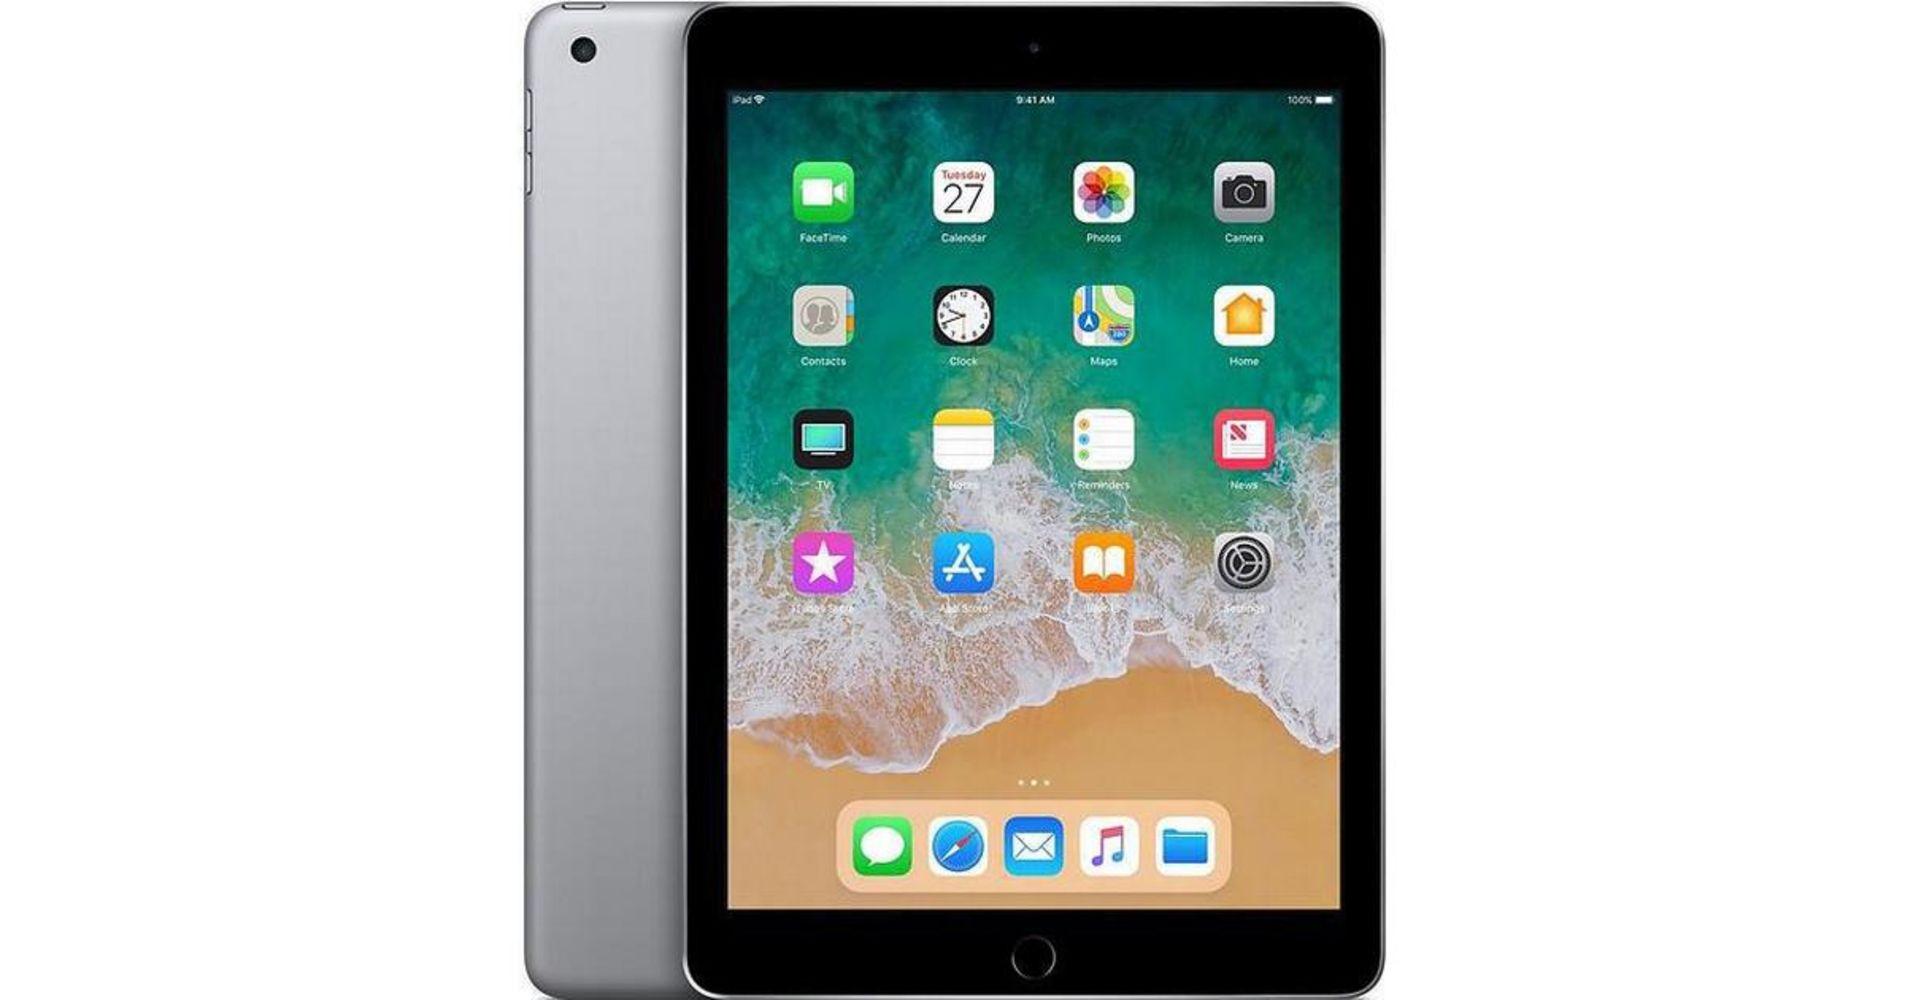 Big-Name Brand New and Graded Tech - Bose, Apple, Beats, Sennheiser & More